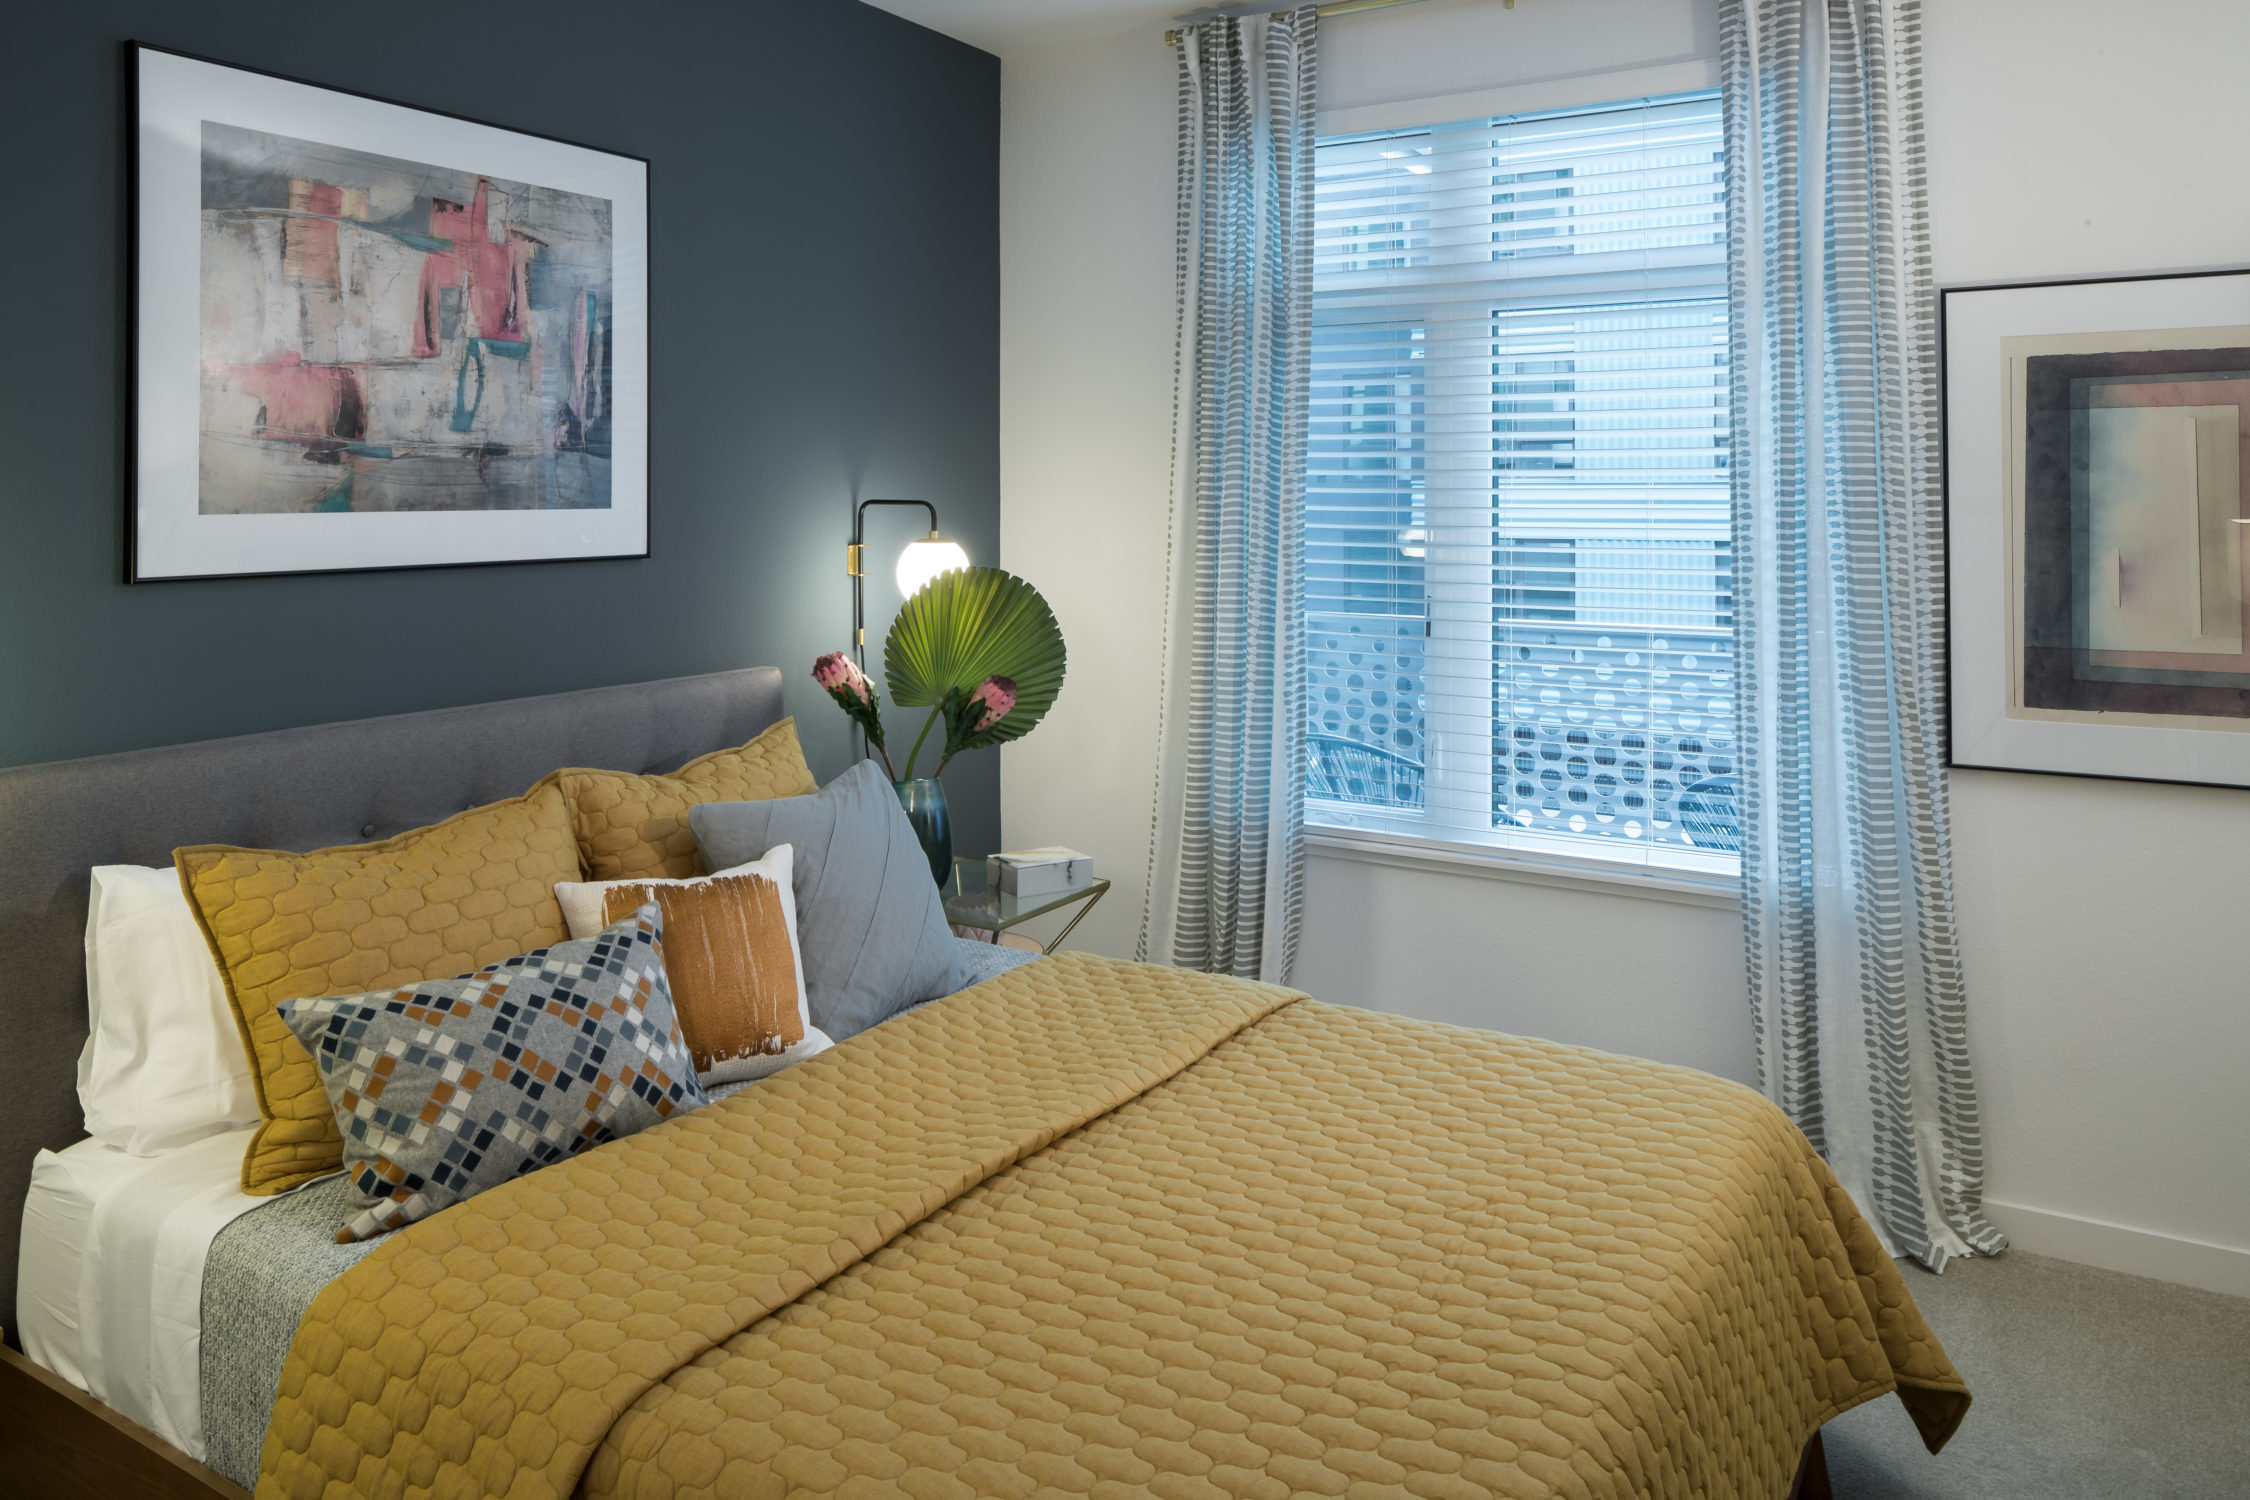 INT 03 Interior Bedroom TCRA 4193 516